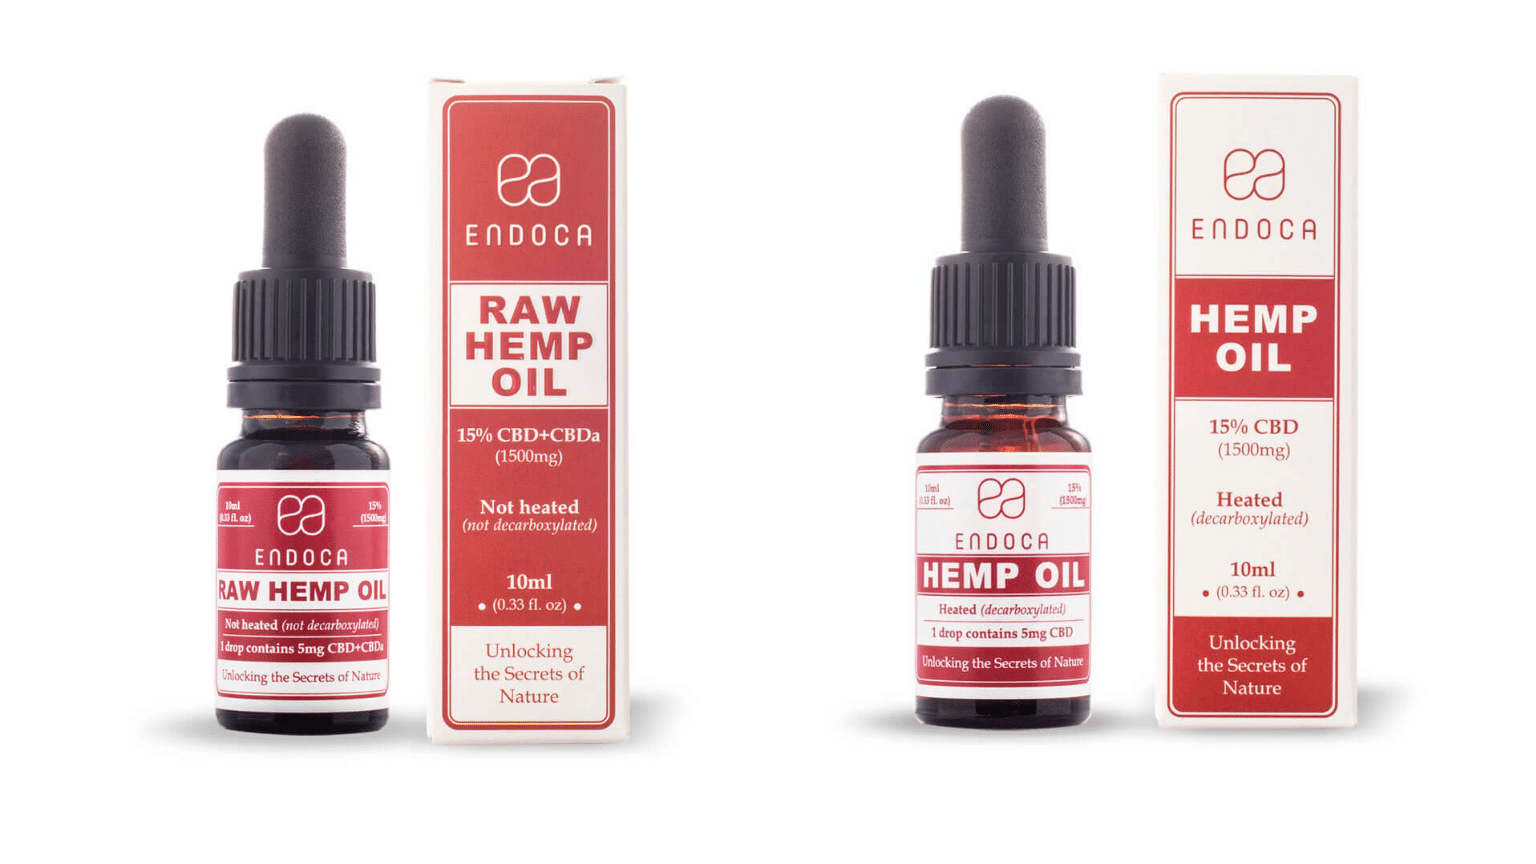 endoca-cbd-hemp-oil